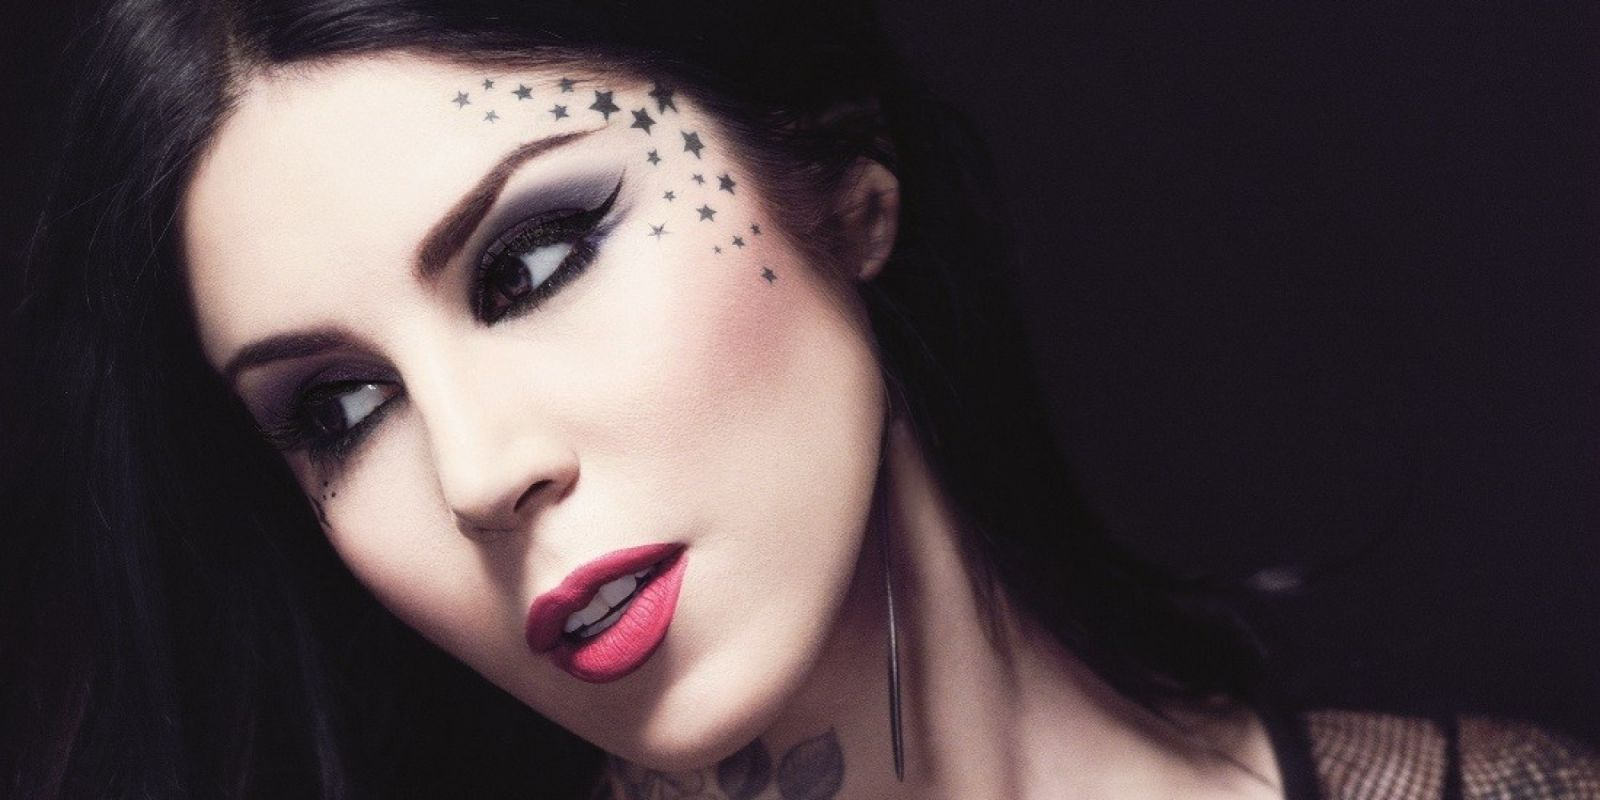 Каких косметических брендов нам не хватает в Украине: категория люкс - фото №2